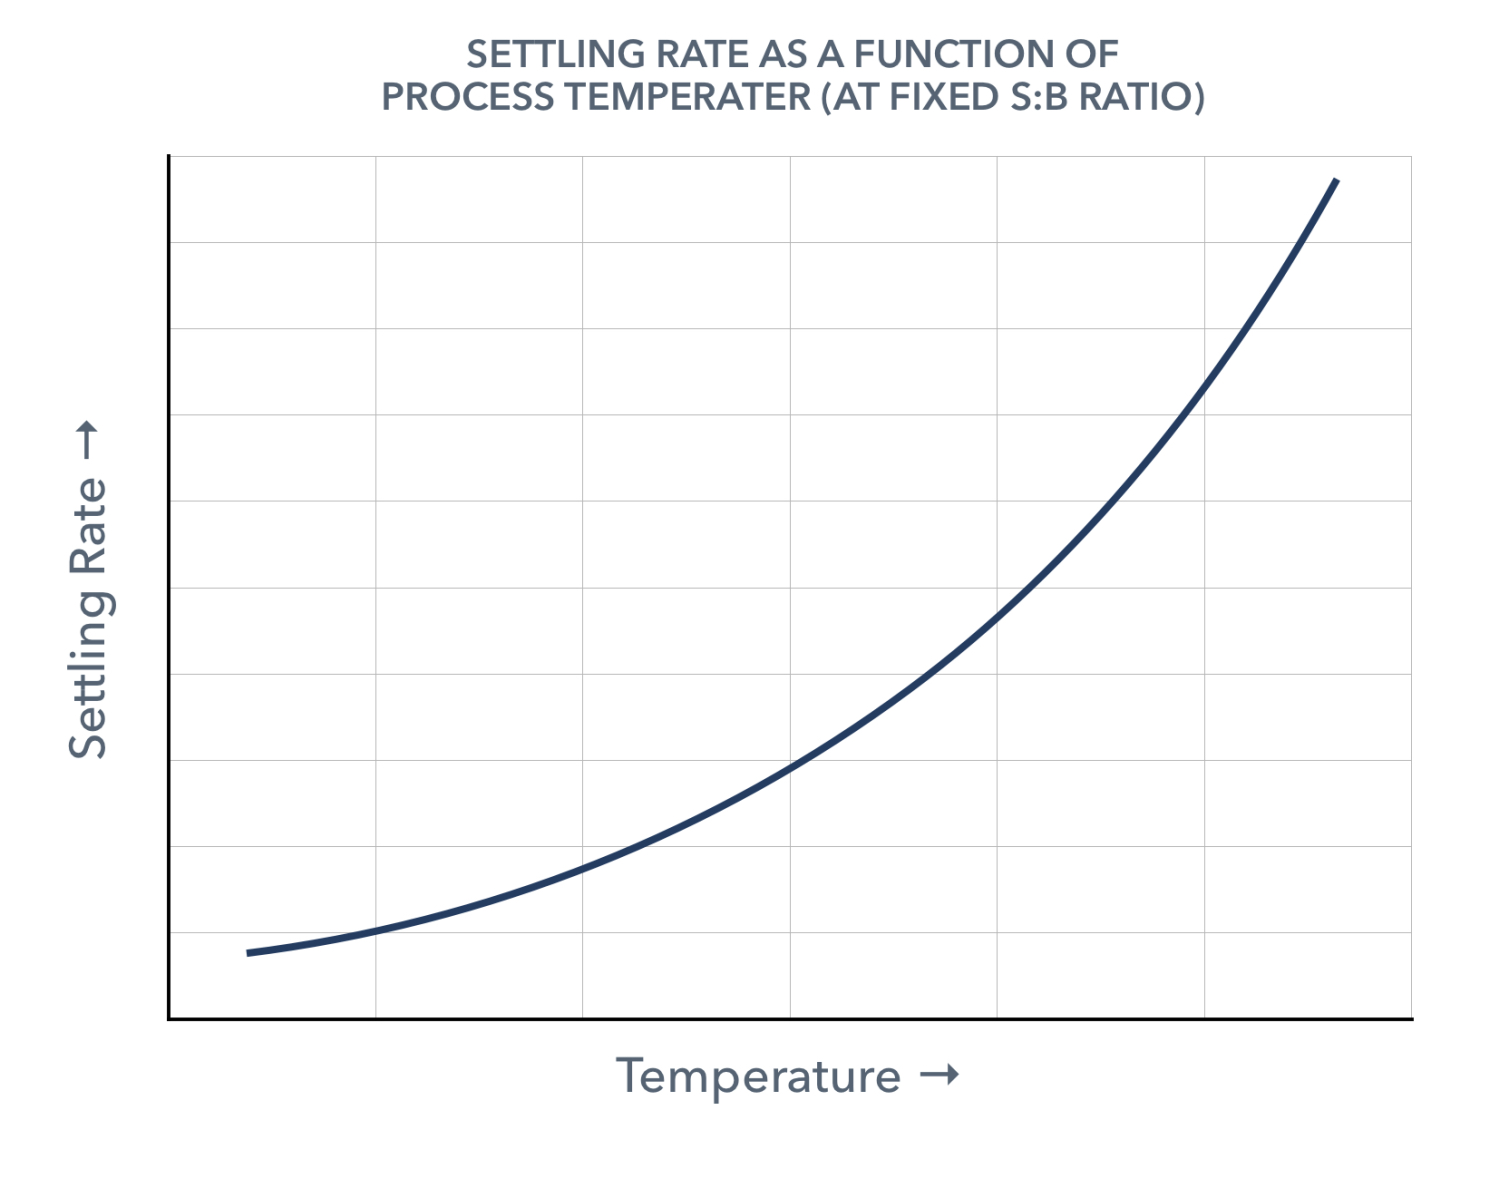 asphaltene-settling-rate-solvent-bitumen-ratio.png